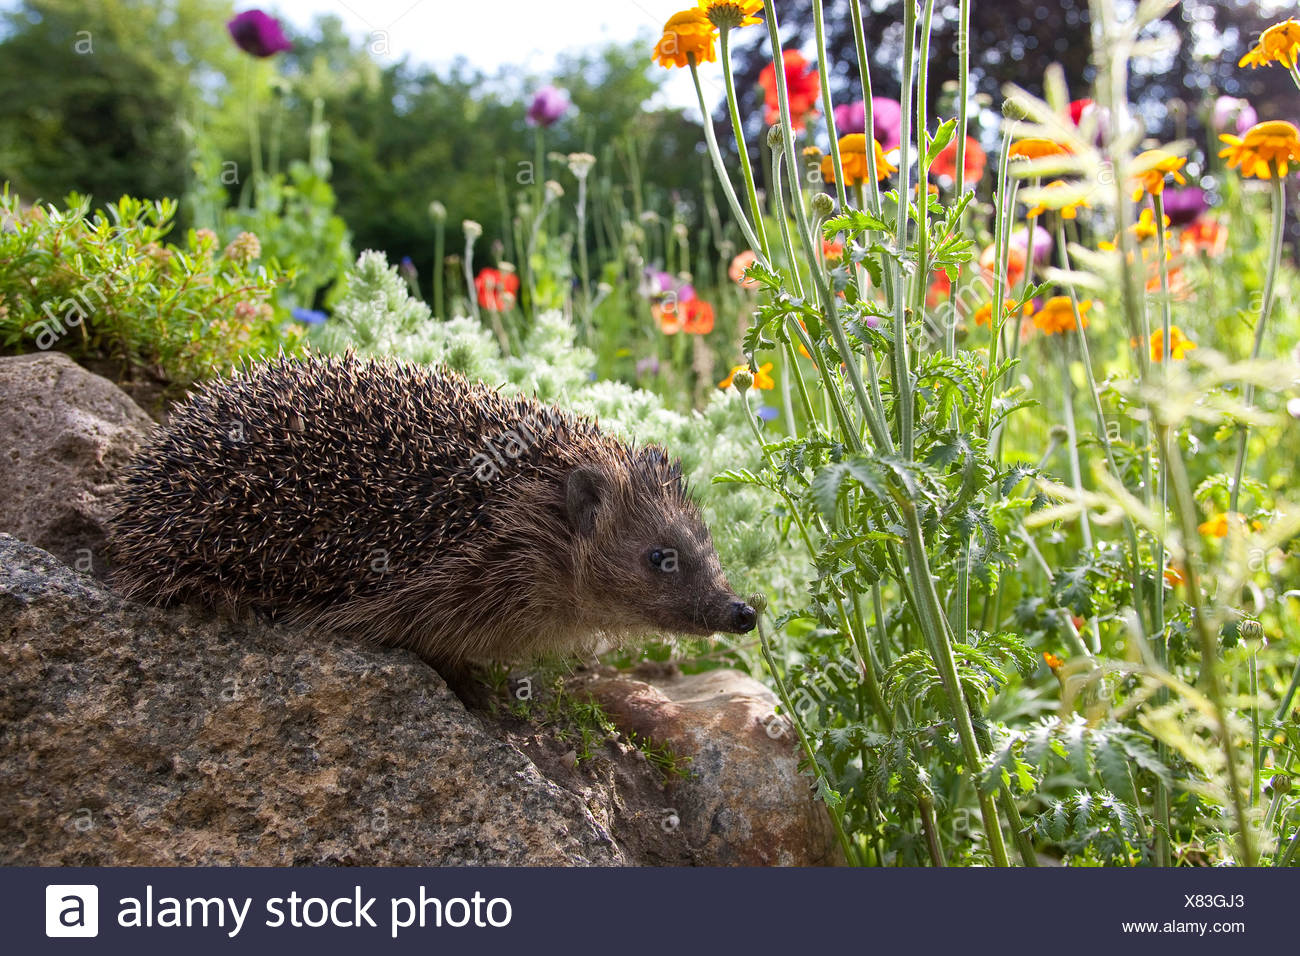 Western hedgehog, European hedgehog (Erinaceus europaeus), in the garden, Germany - Stock Image